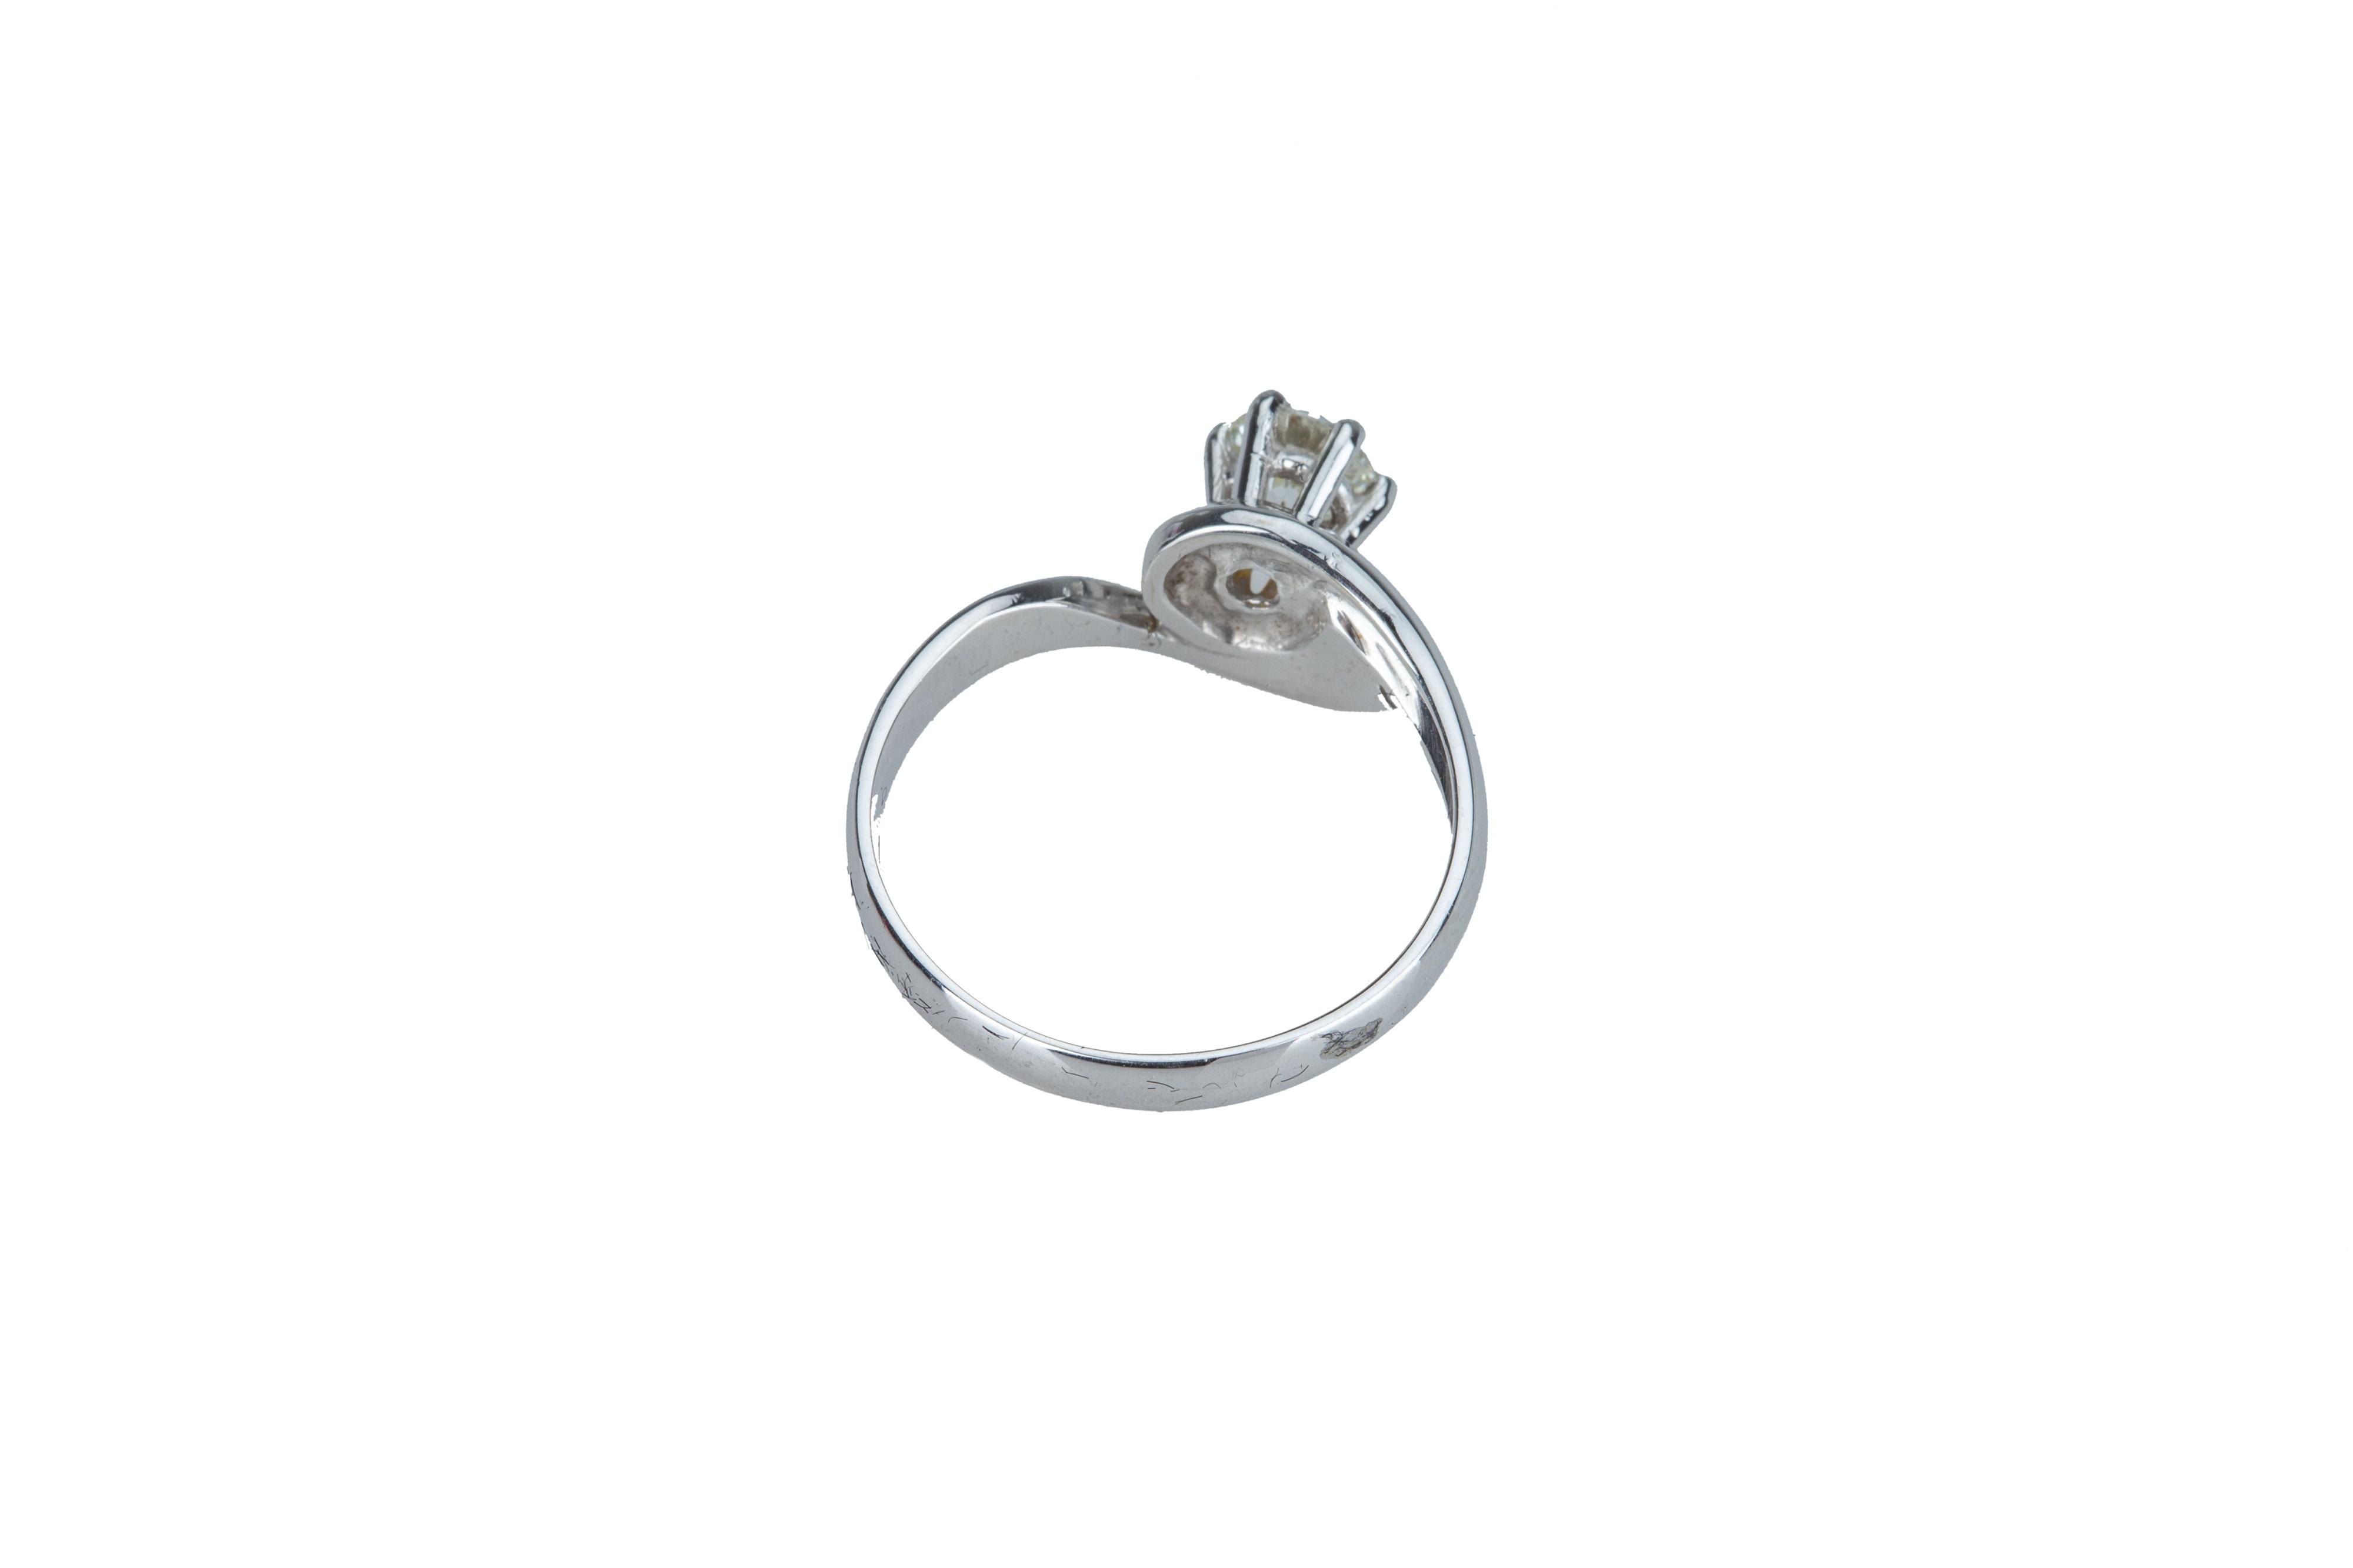 A single stone diamond ring. - Image 3 of 3